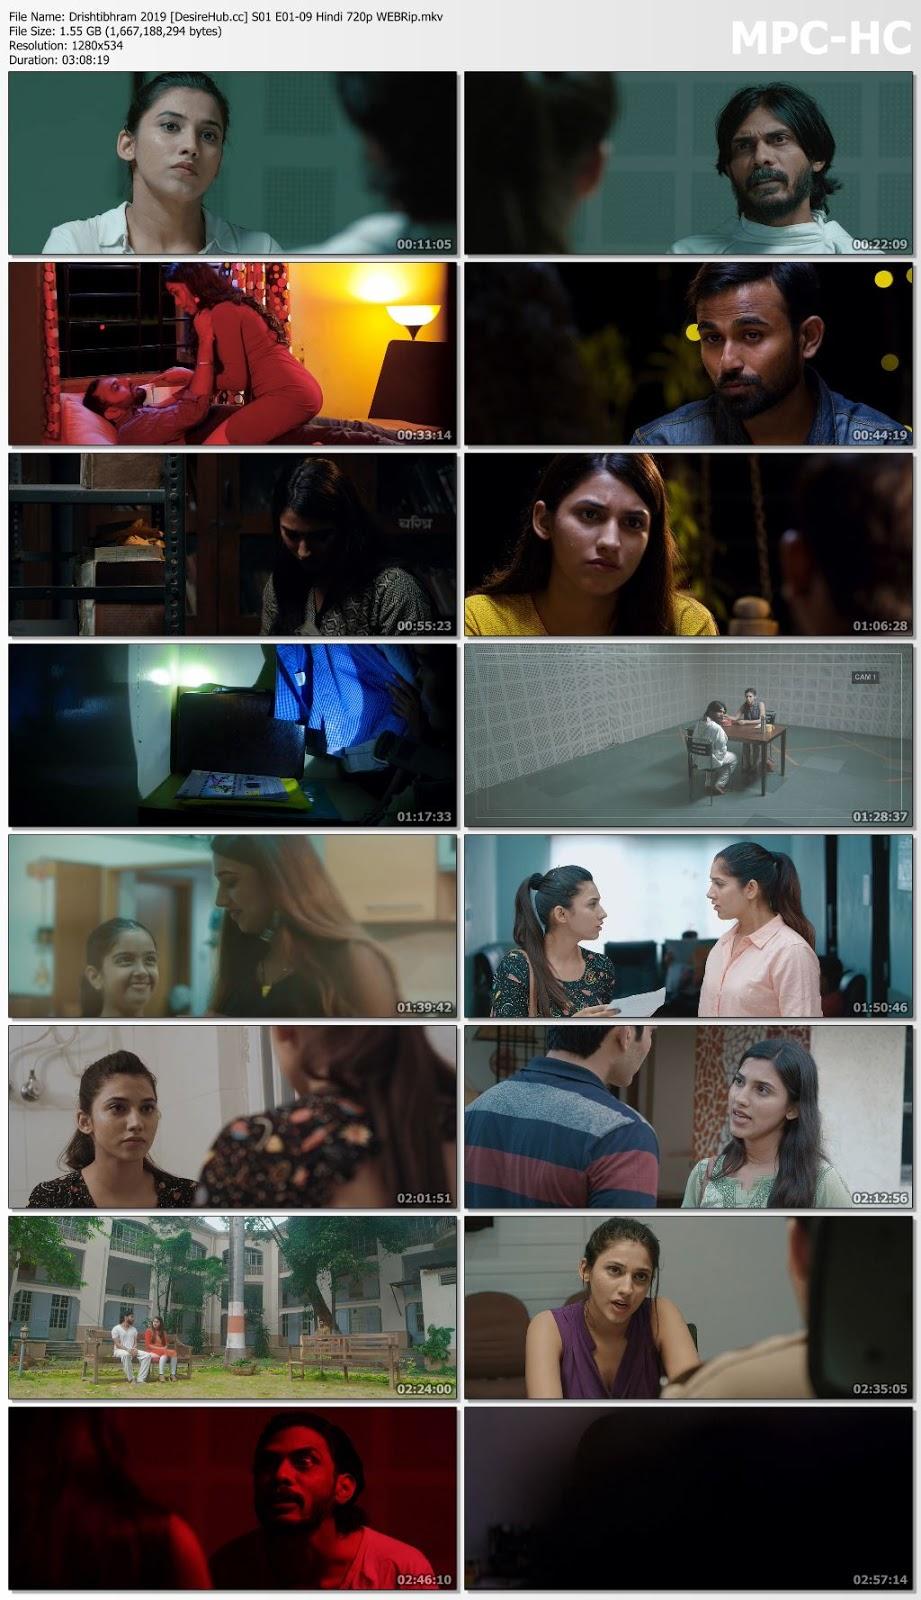 Drishtibhram 2019 WEB-Series S01 [E01-09] Hindi 720p WebRip Desirehub